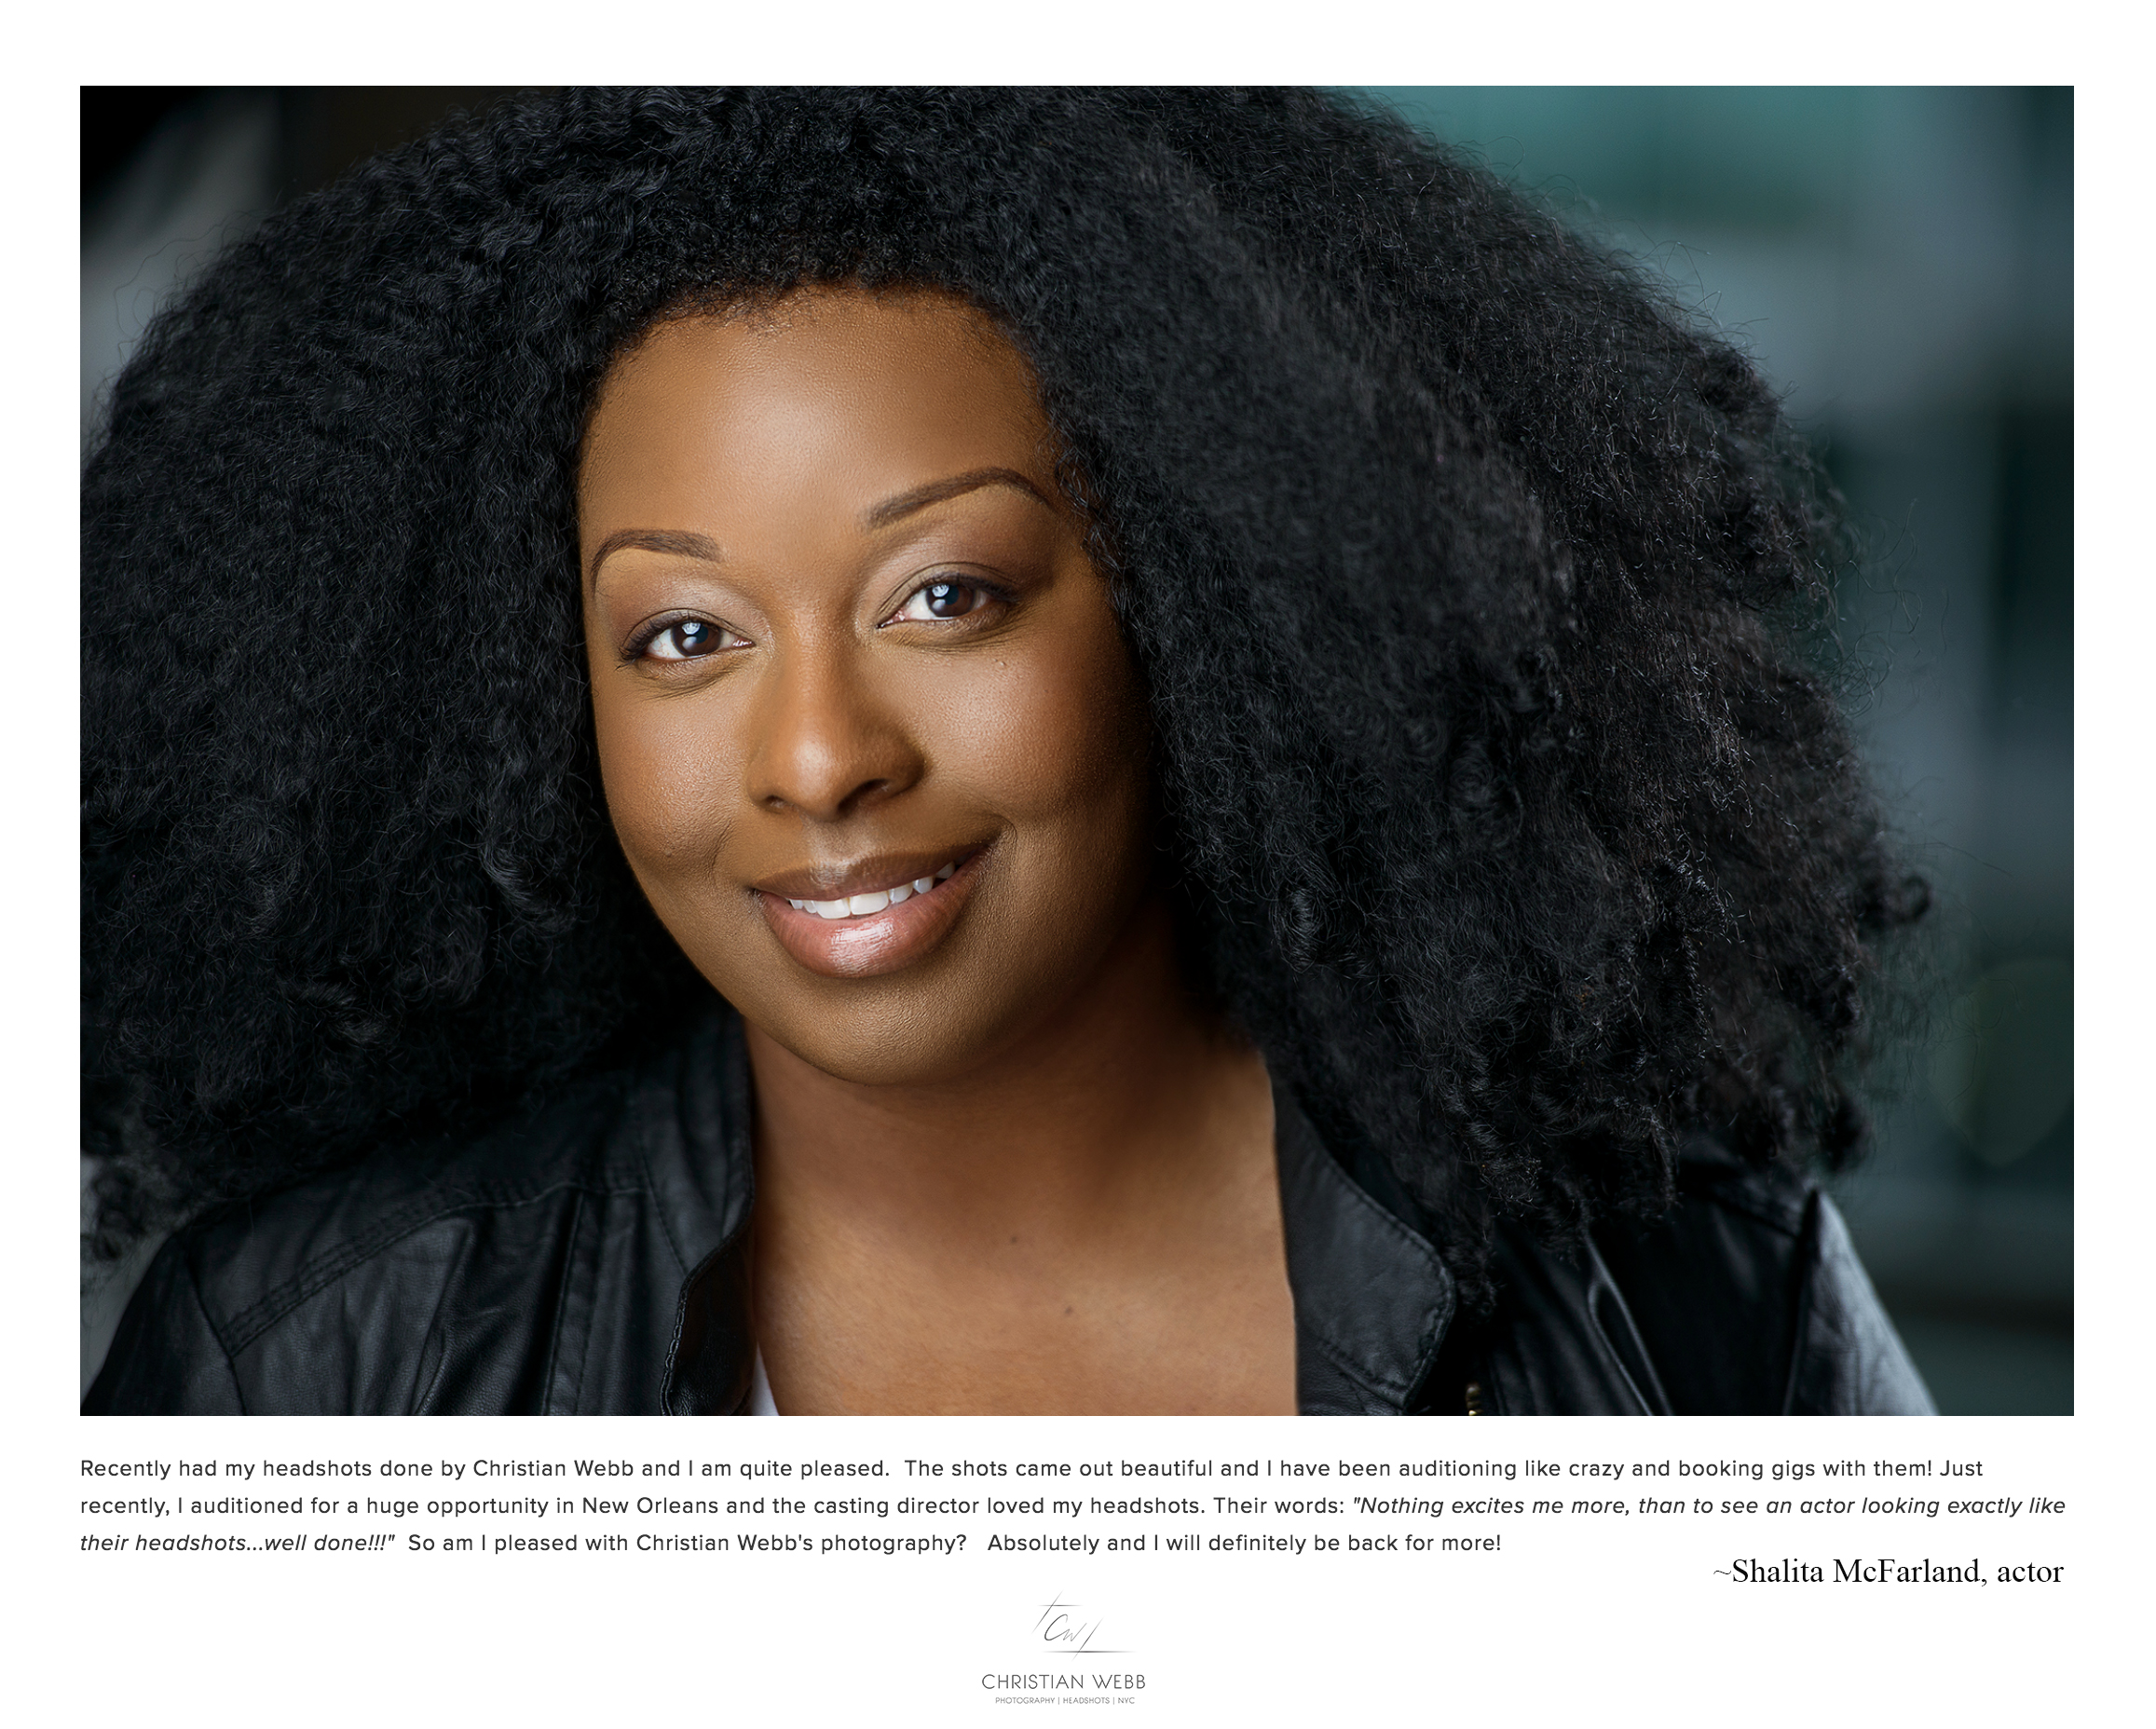 Christian Webb-Headshots-Atlanta-Shalita-Actors-Review-Website Grab.jpg